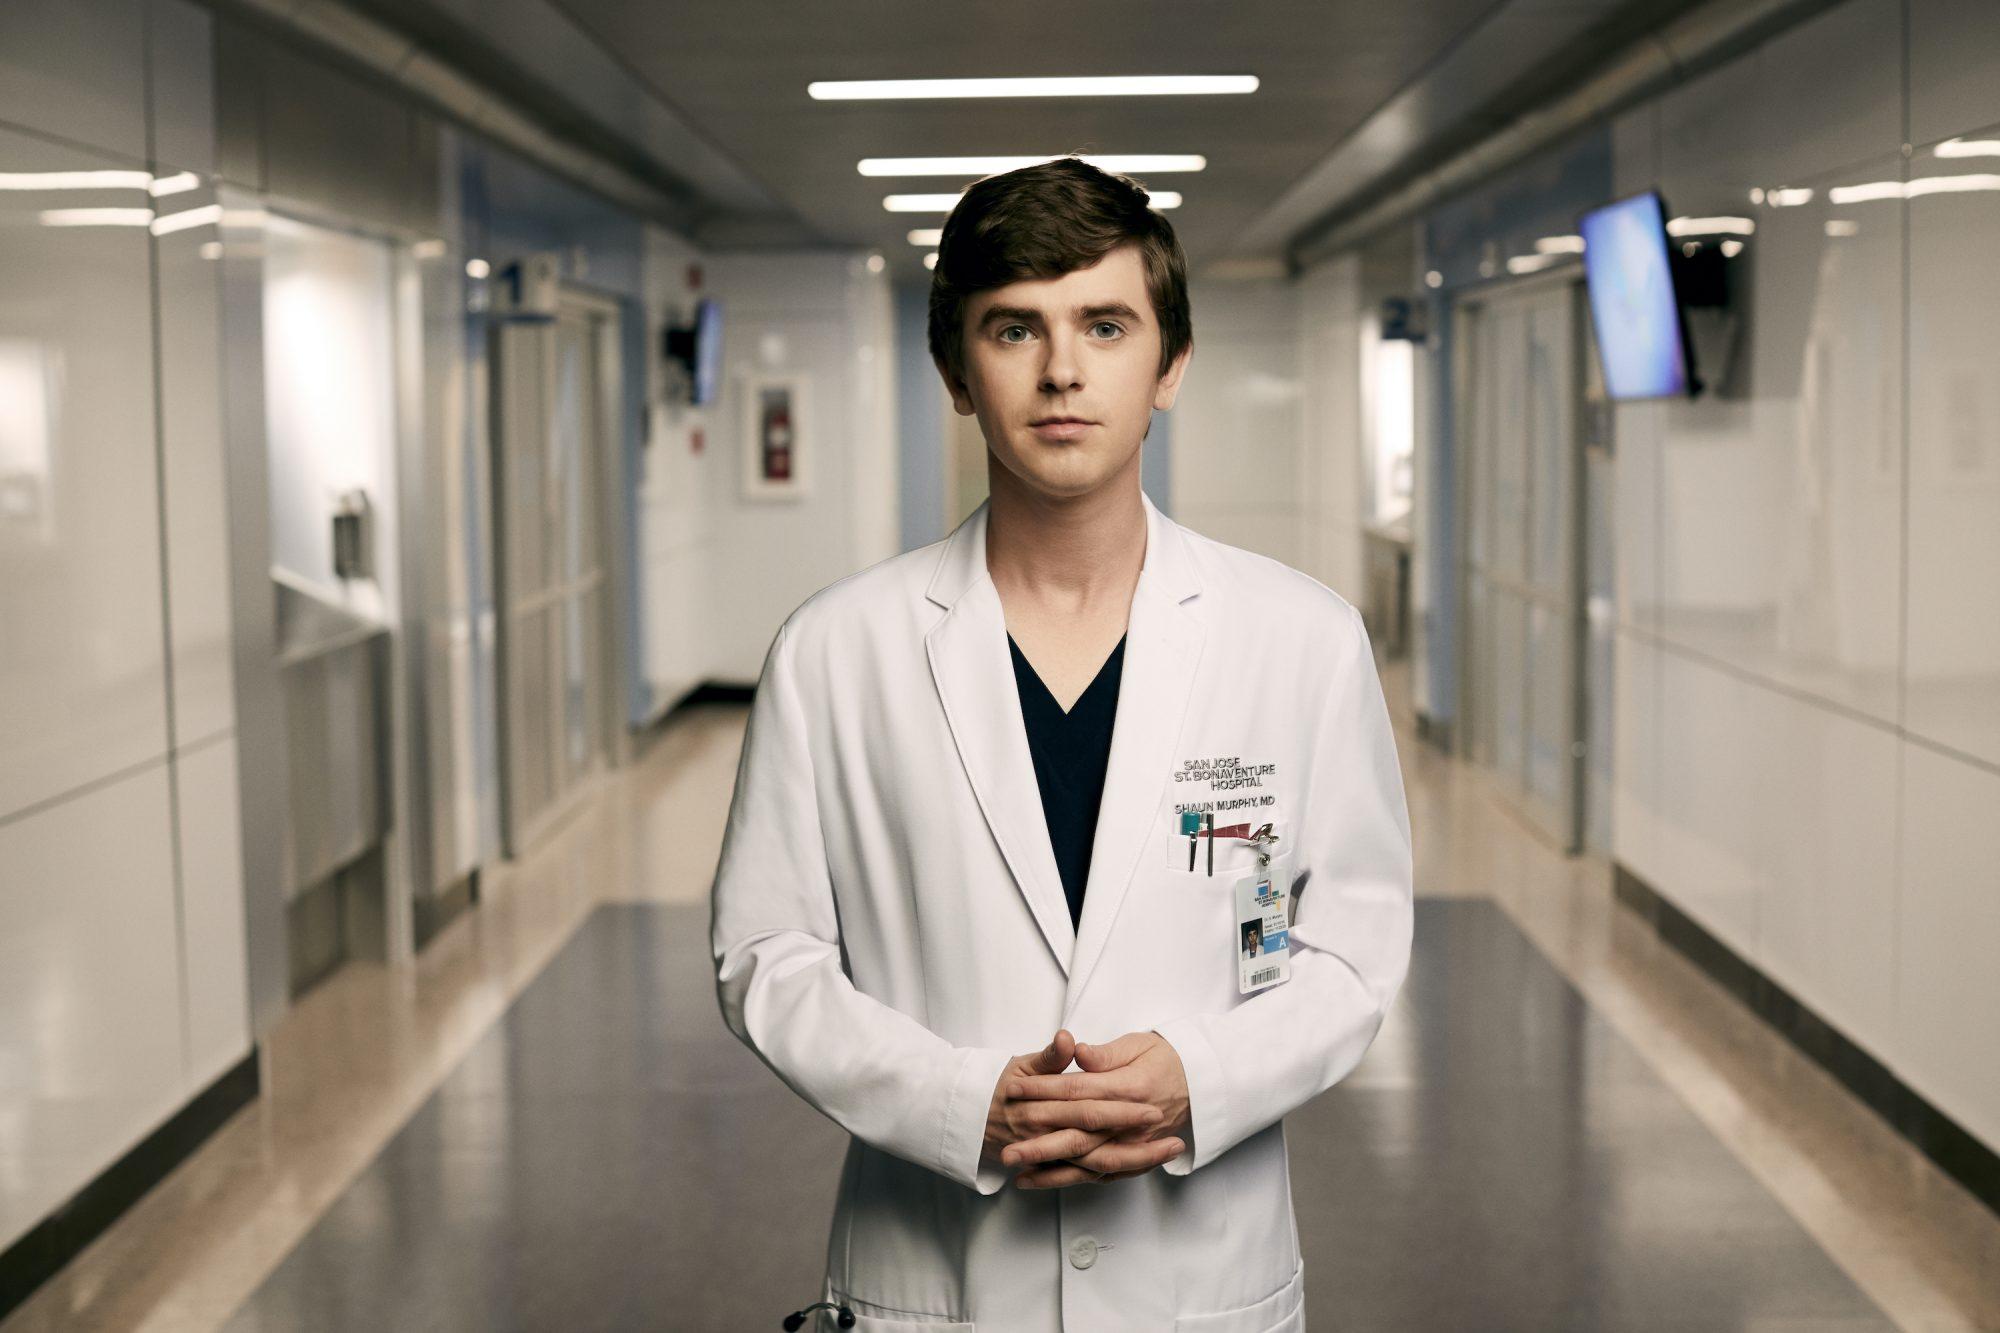 'Good Doctor' Renewed for Season 5 at ABC